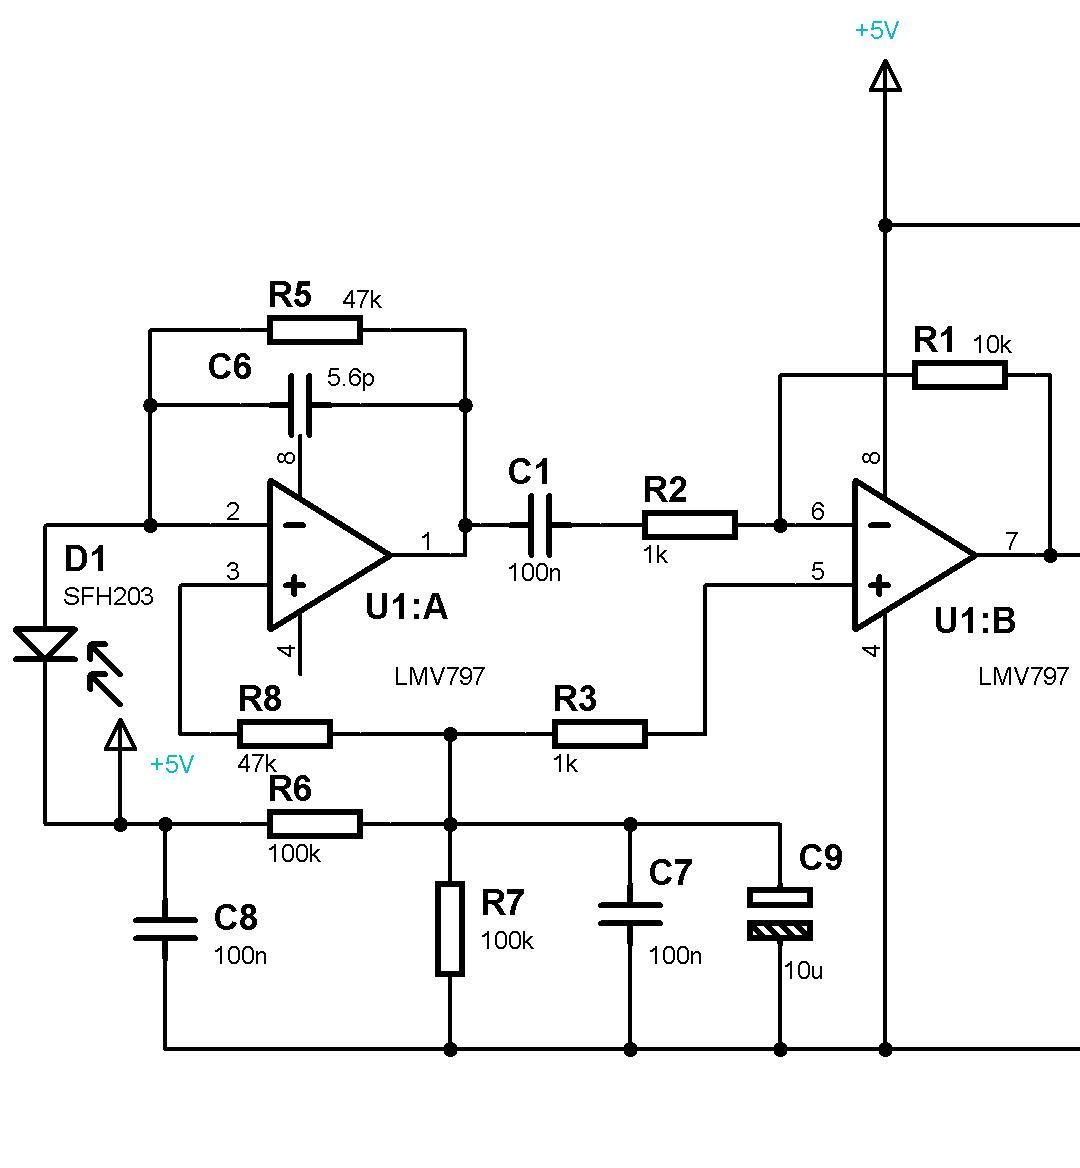 fig 14 ampli LMV797